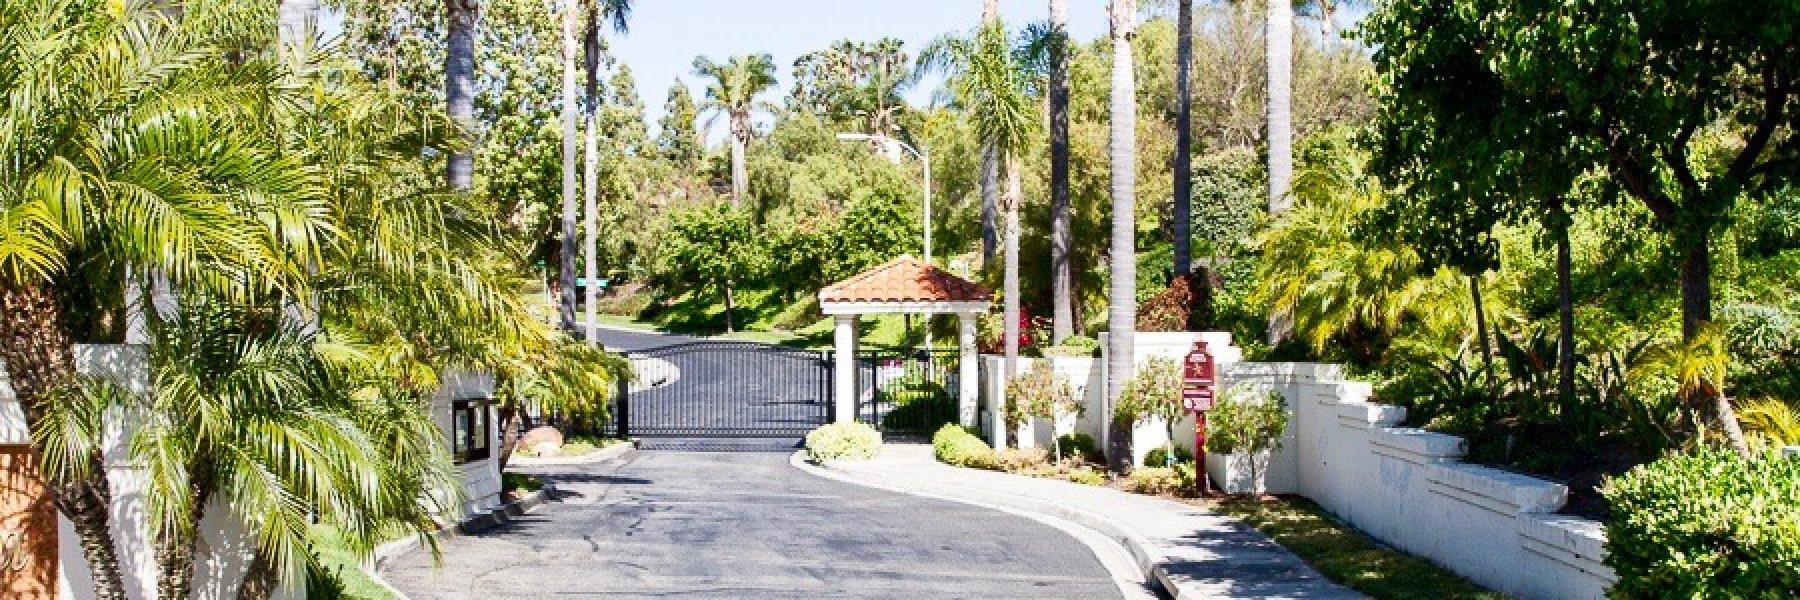 Senterra is a community of homes in San Diego California